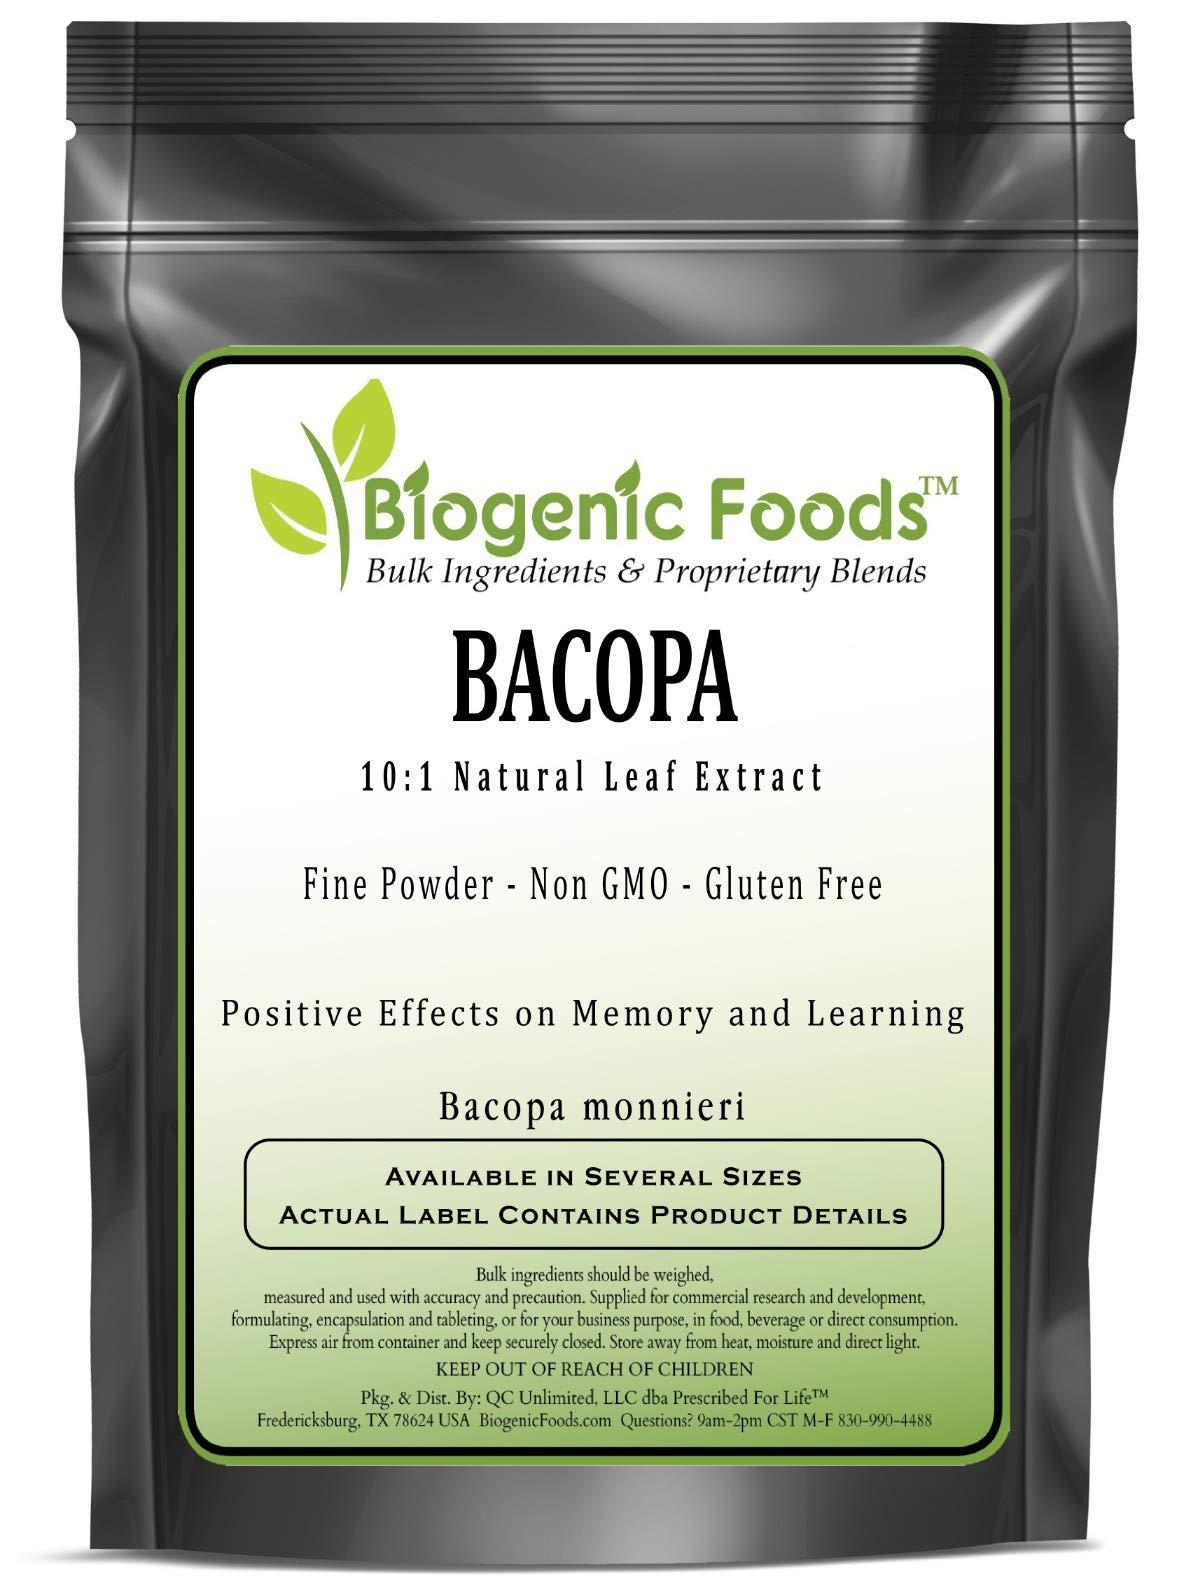 Bacopa - 10:1 Natural Leaf Extract Fine Powder (Bacopa monnieri), 25 kg